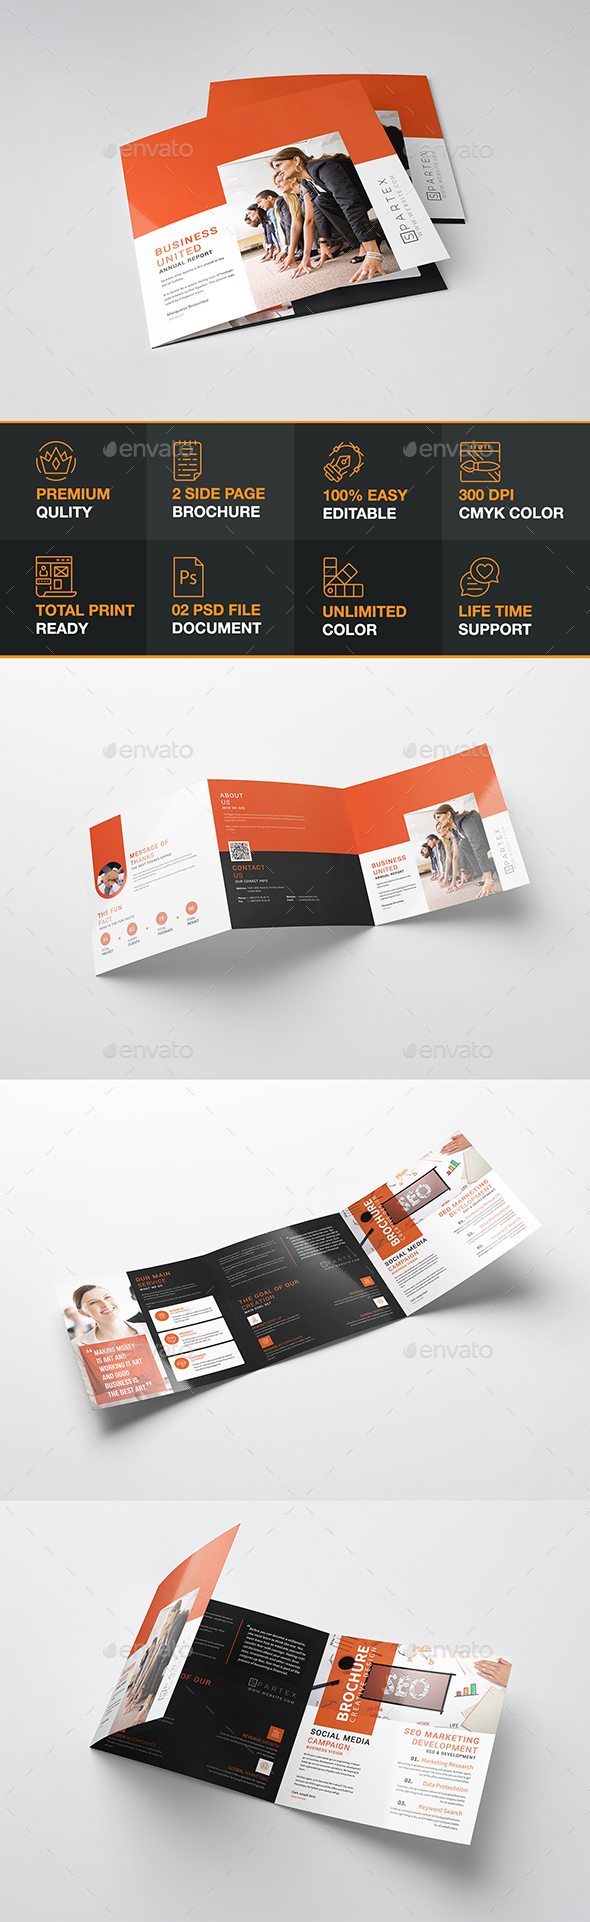 Romalio Square Tri-fold Brochure - Brochures Print Templates